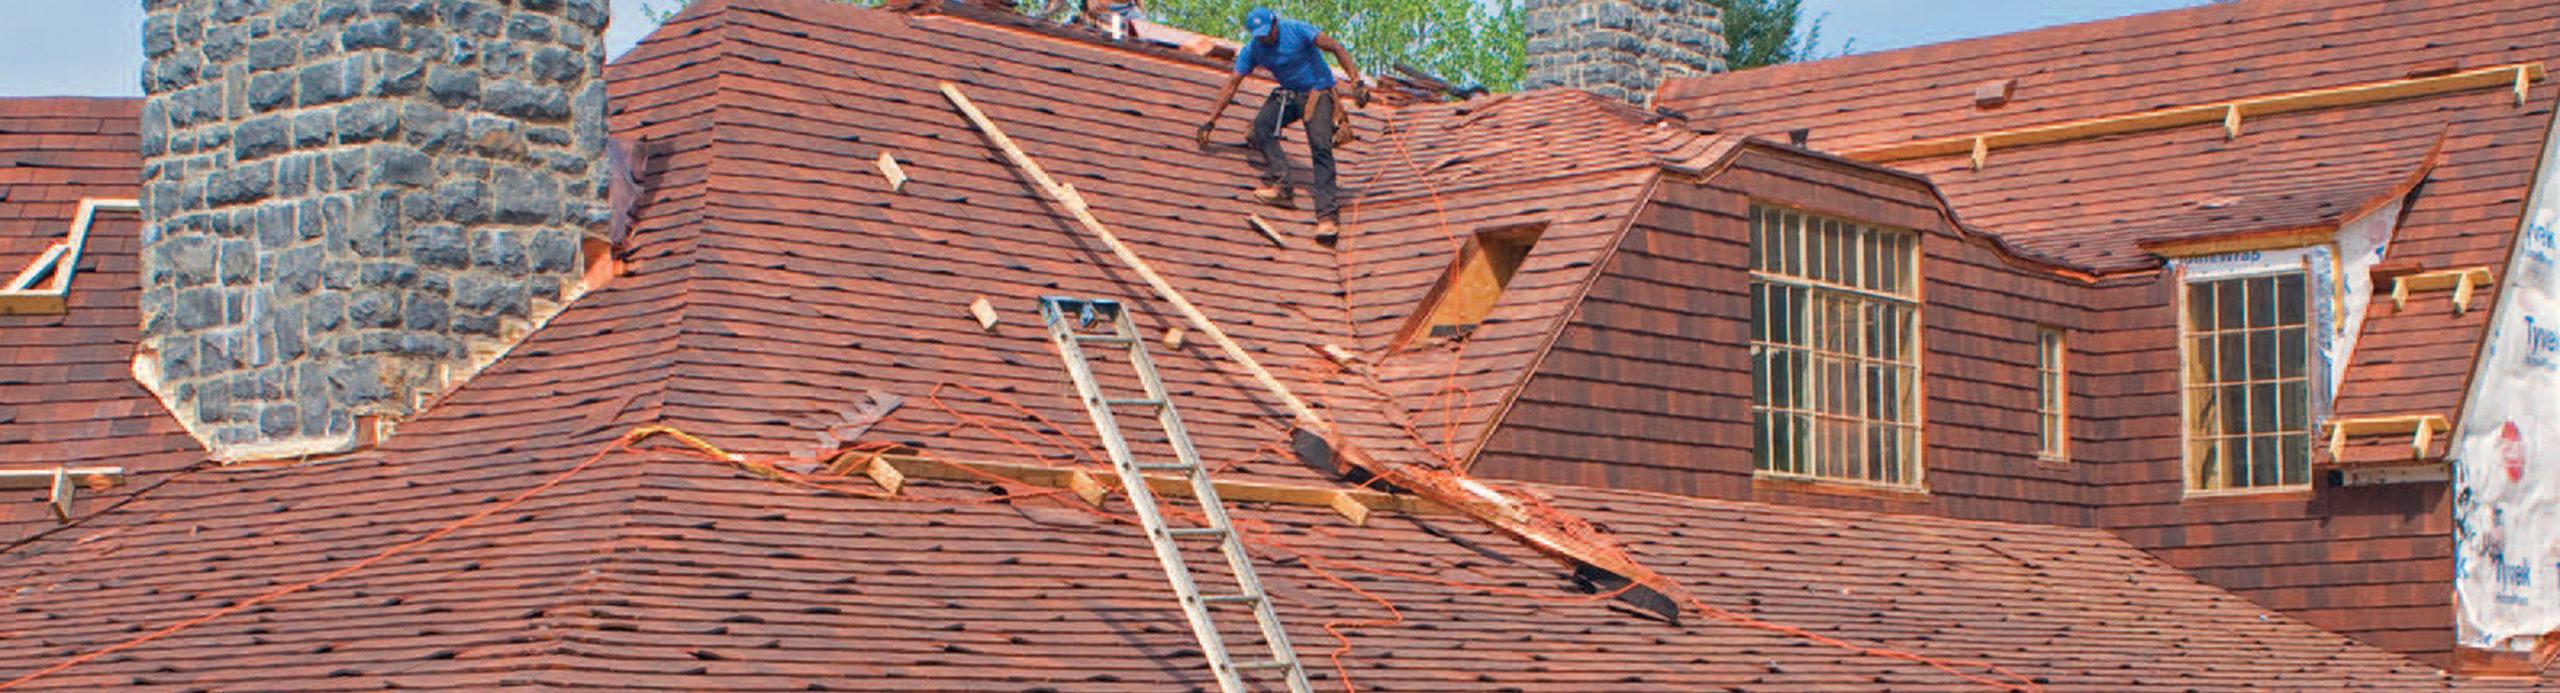 Copper Nails Roof Tiles